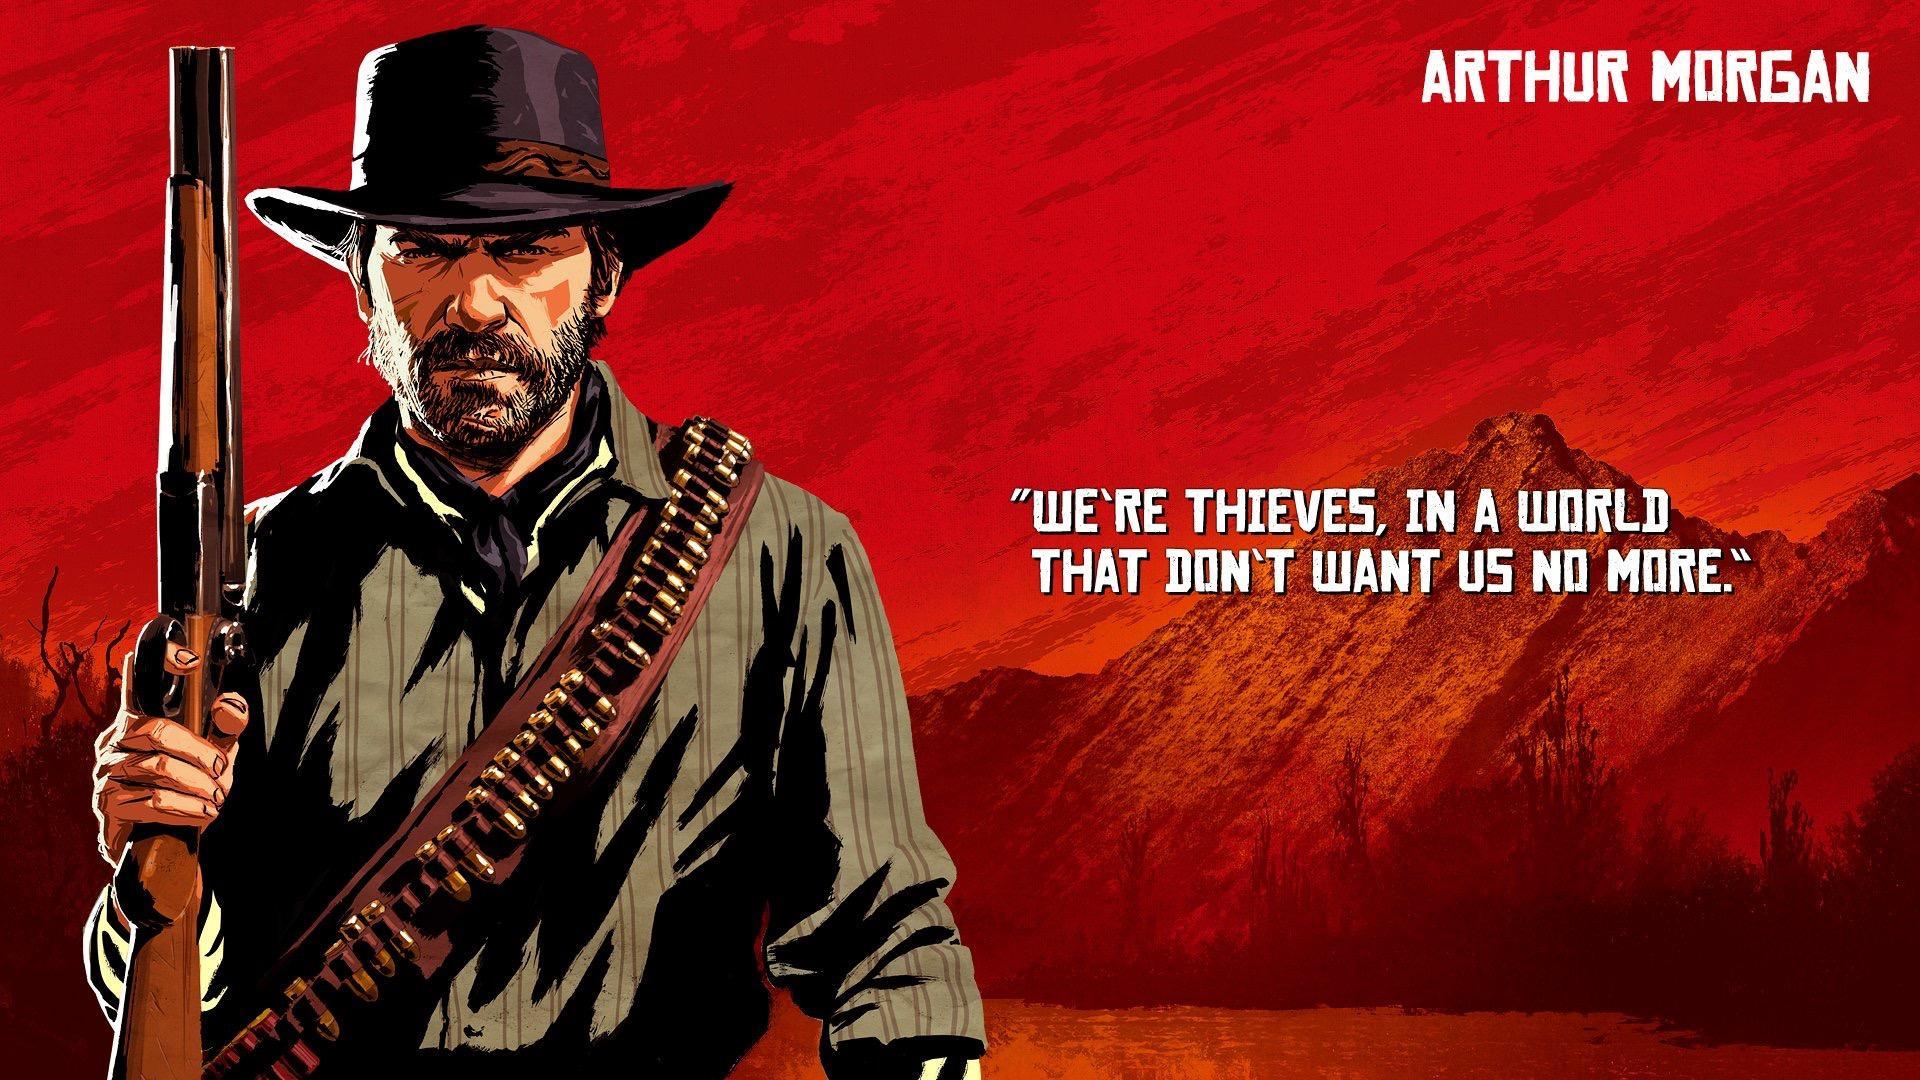 Prosječna starost stanovništva RH je sredinom prošle godine iznosila 43,6 godina Red_Dead_Redemption_2_Official_Artwork_Arthur